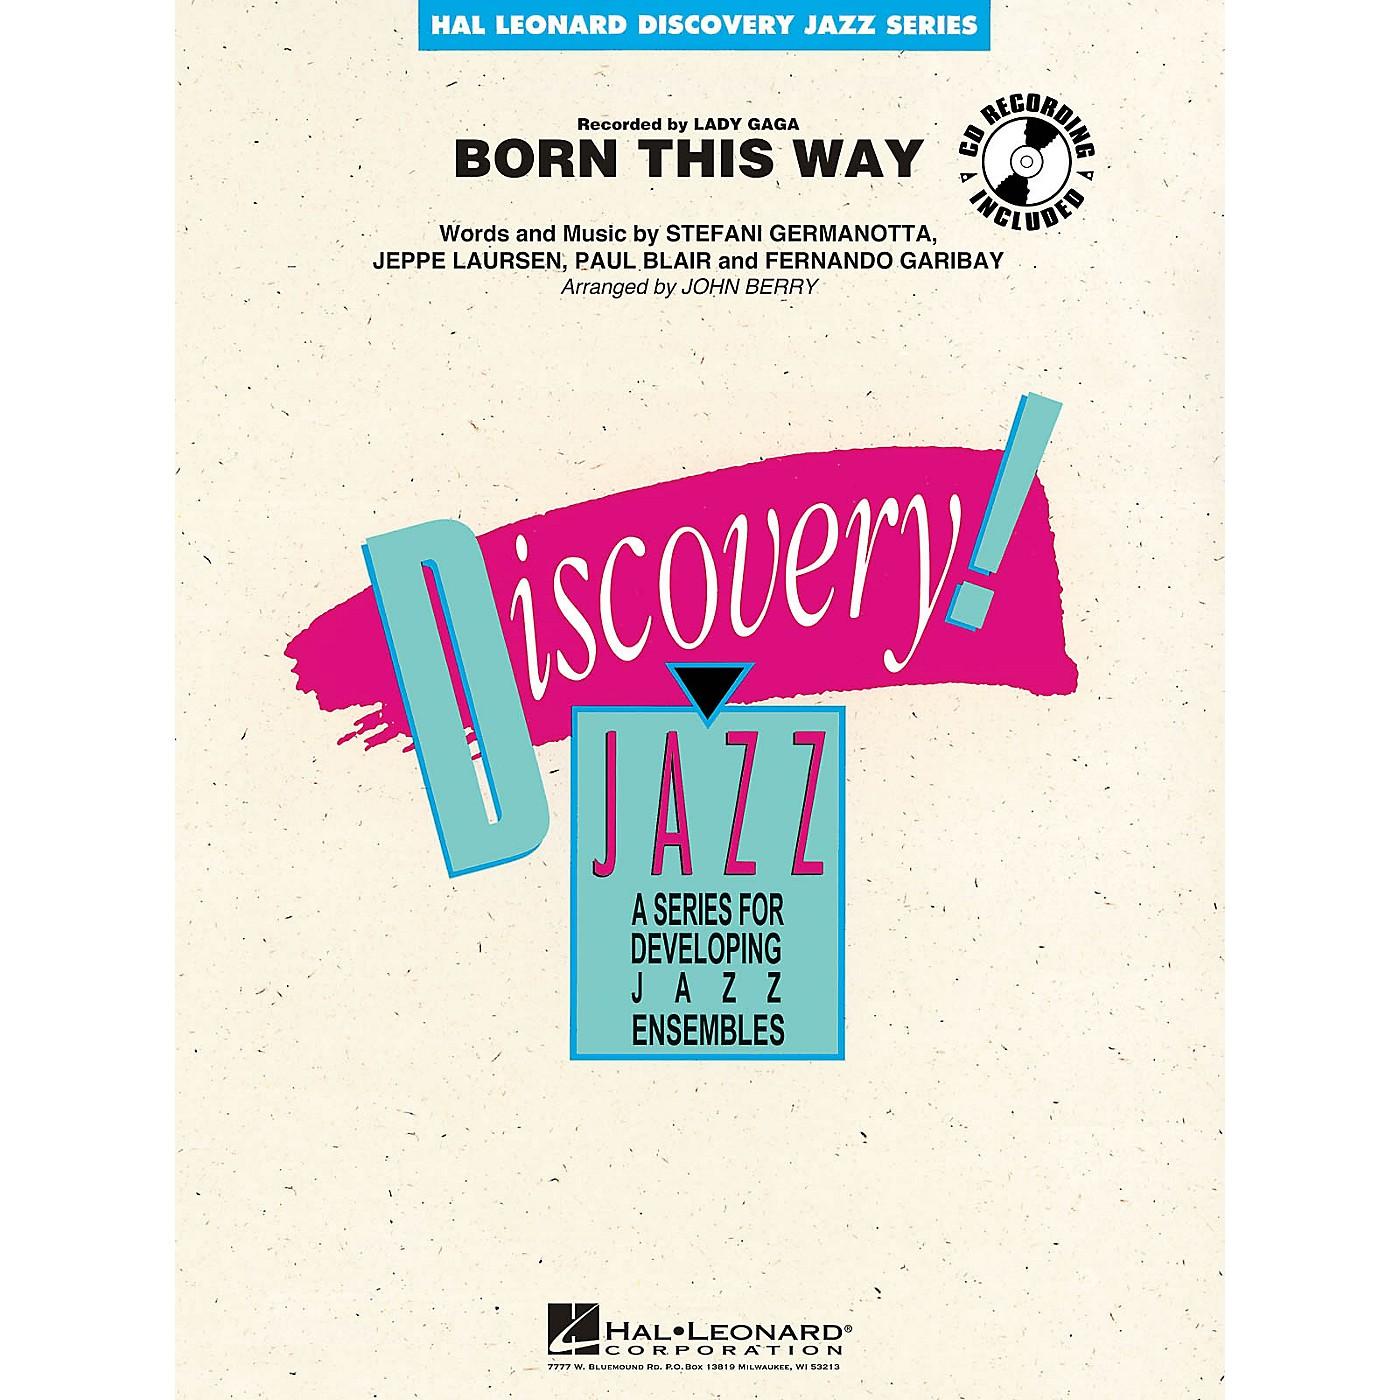 Hal Leonard Born This Way Jazz Band Level 1-2 by Lady Gaga Arranged by John Berry thumbnail